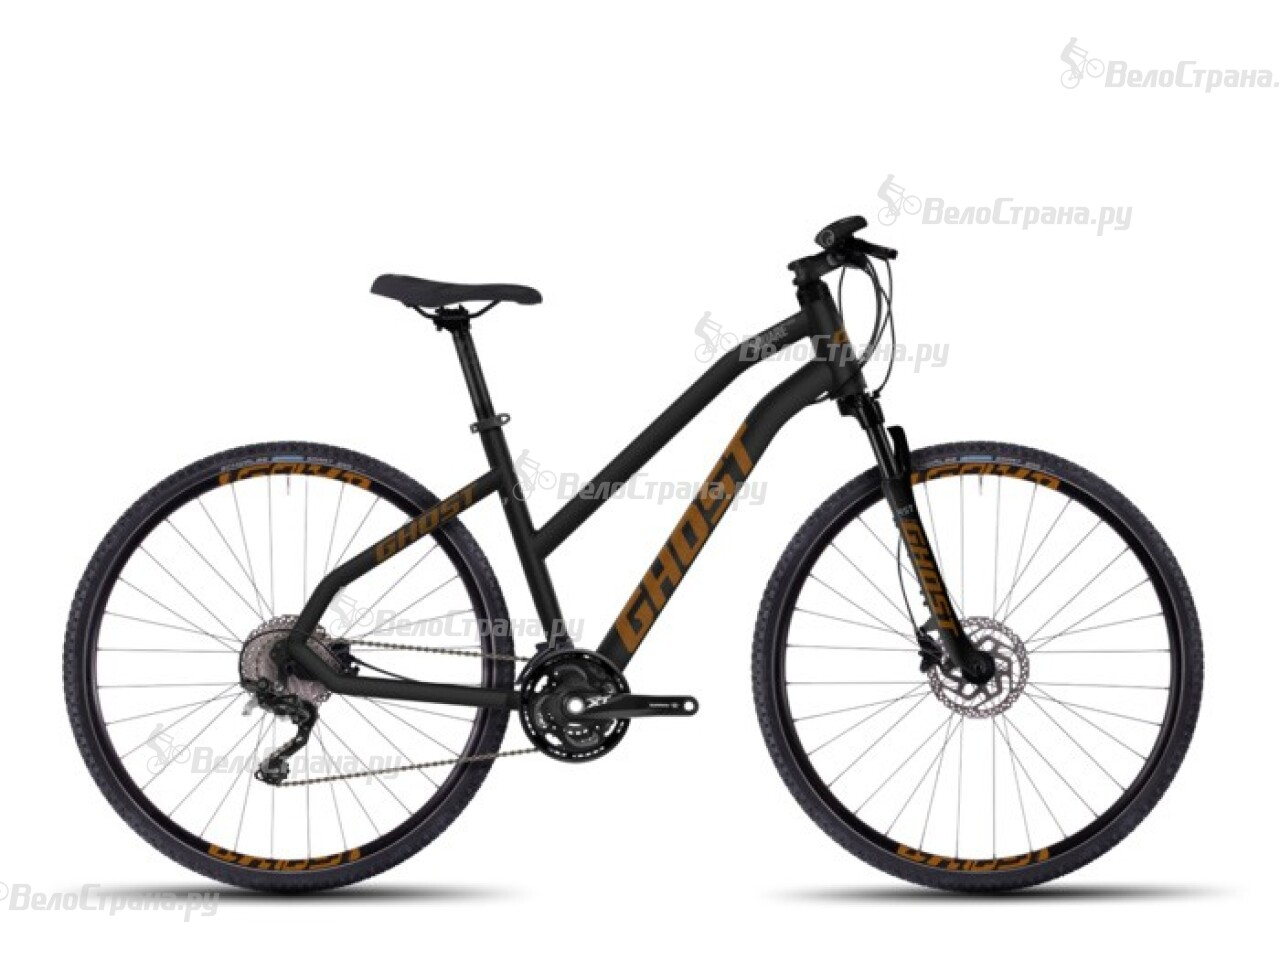 Велосипед Ghost SQUARE Cross 6 Miss (2016) цены онлайн